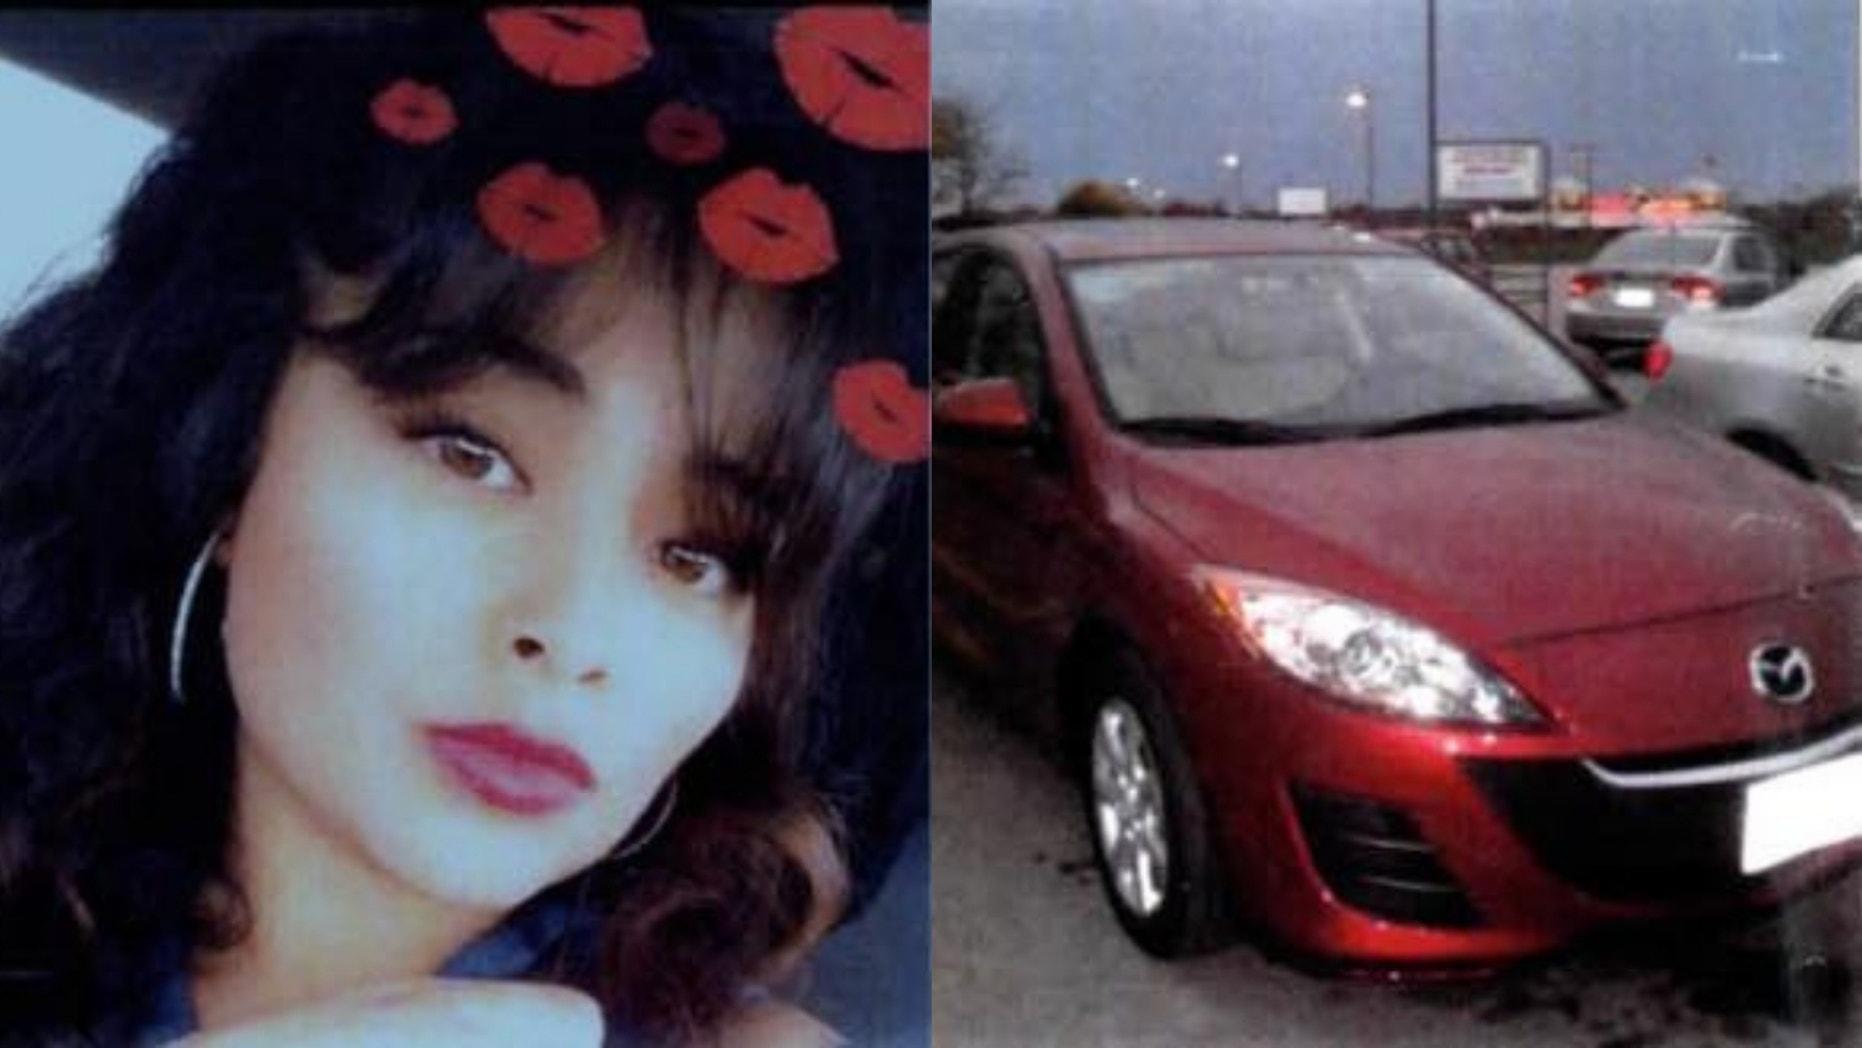 Brenda Lizbeth Montanez was last seen driving in her maroon 2011 Mazda on Jan. 27.